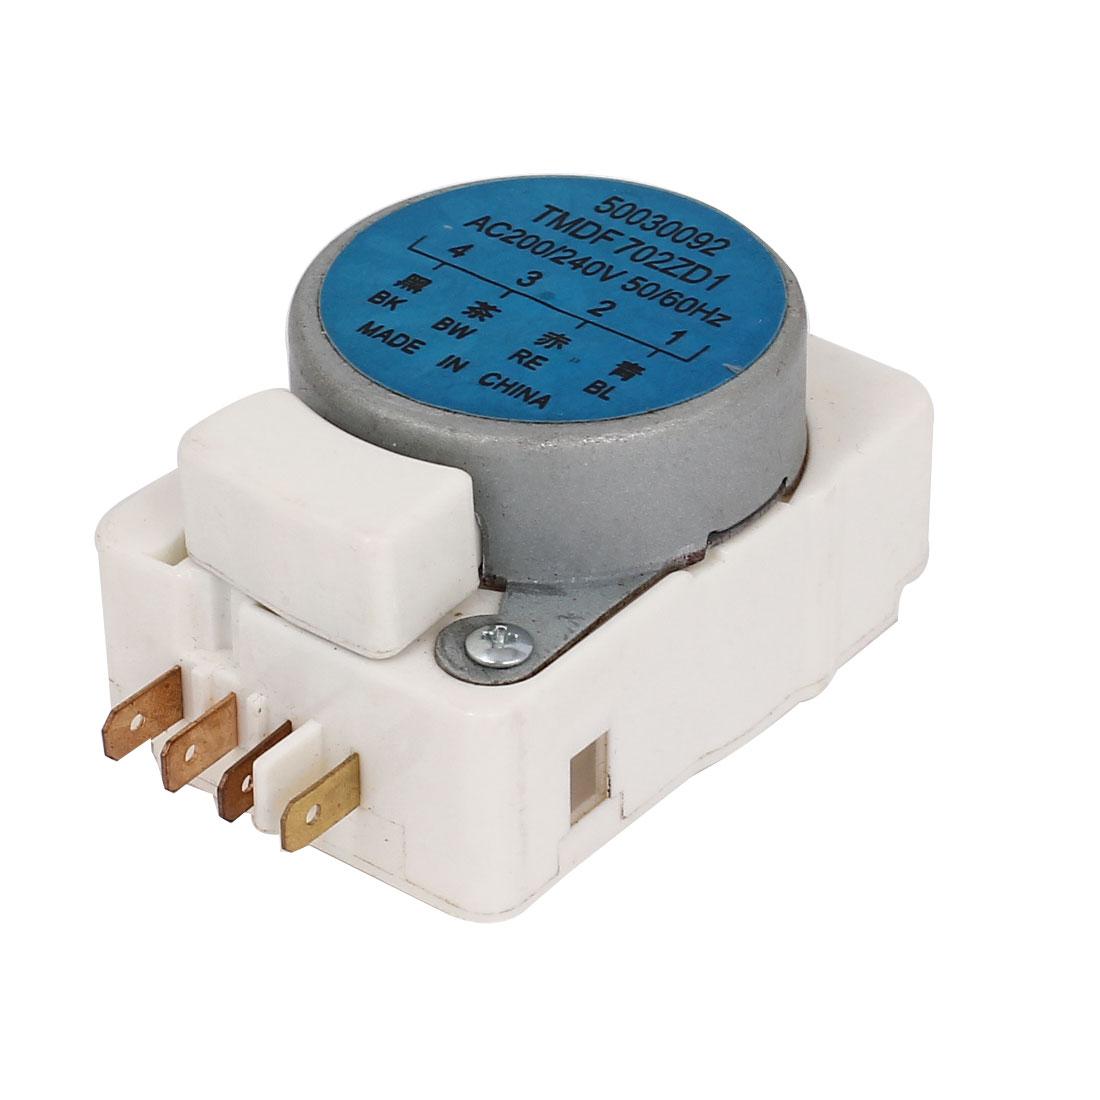 AC 200/240V 50/60Hz TMDF702ZD1 4 Terminals Refrigerator Defrost Timer